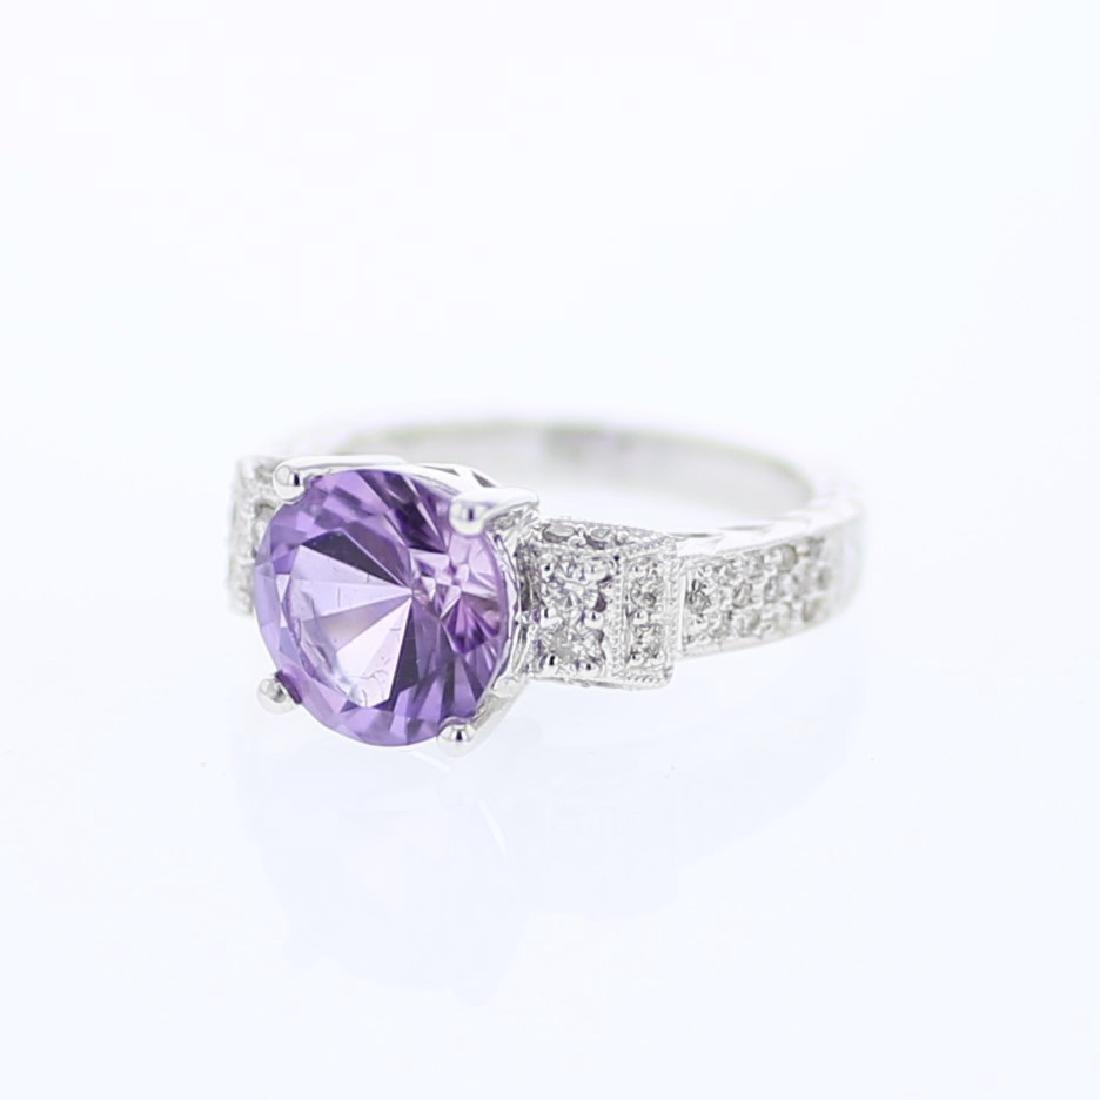 Round cut Amethyst w/ Prong-set Diamond Ring in 18K